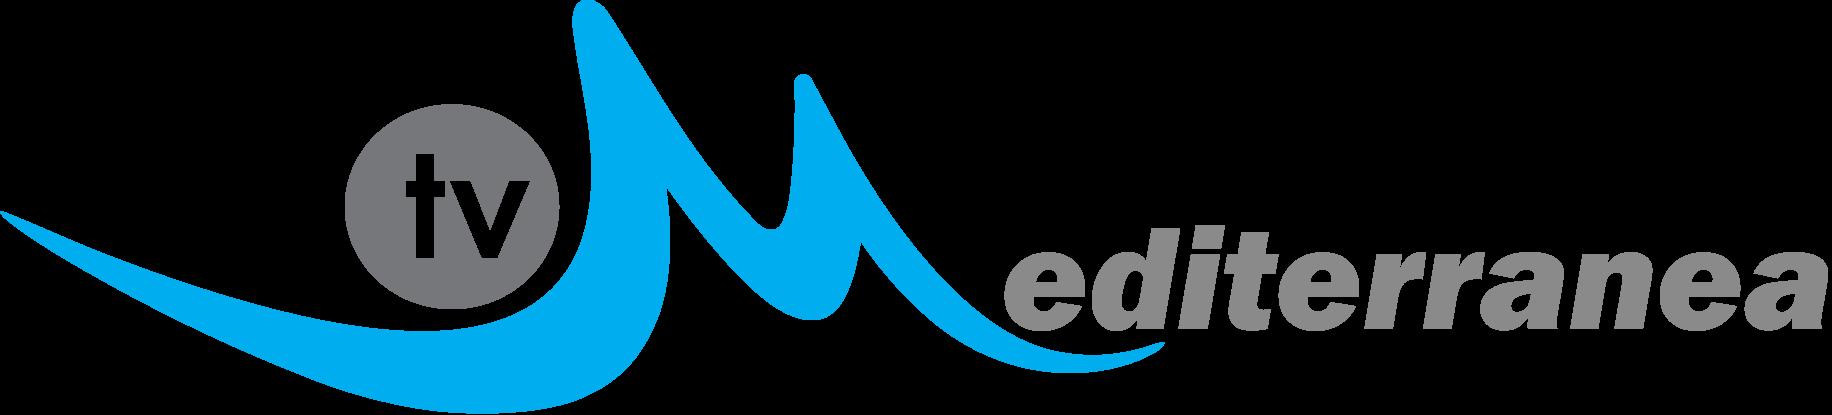 Mediterranea WEB TV